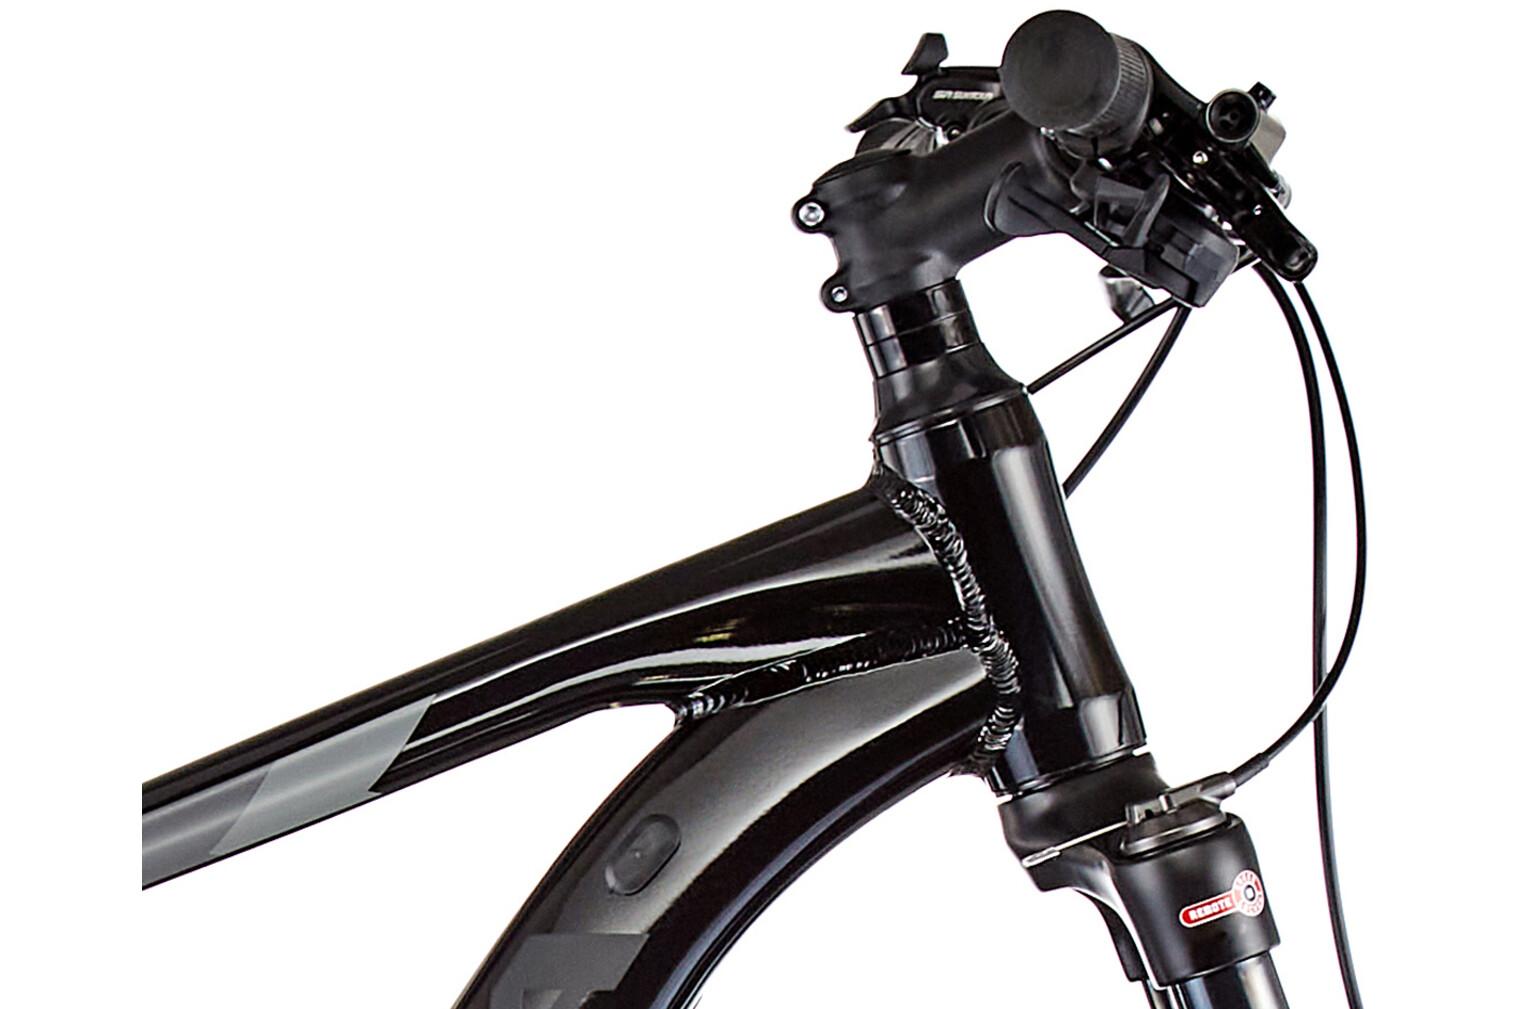 Bicicleta Orbea MX 20 ARO 29 Preto TAM L